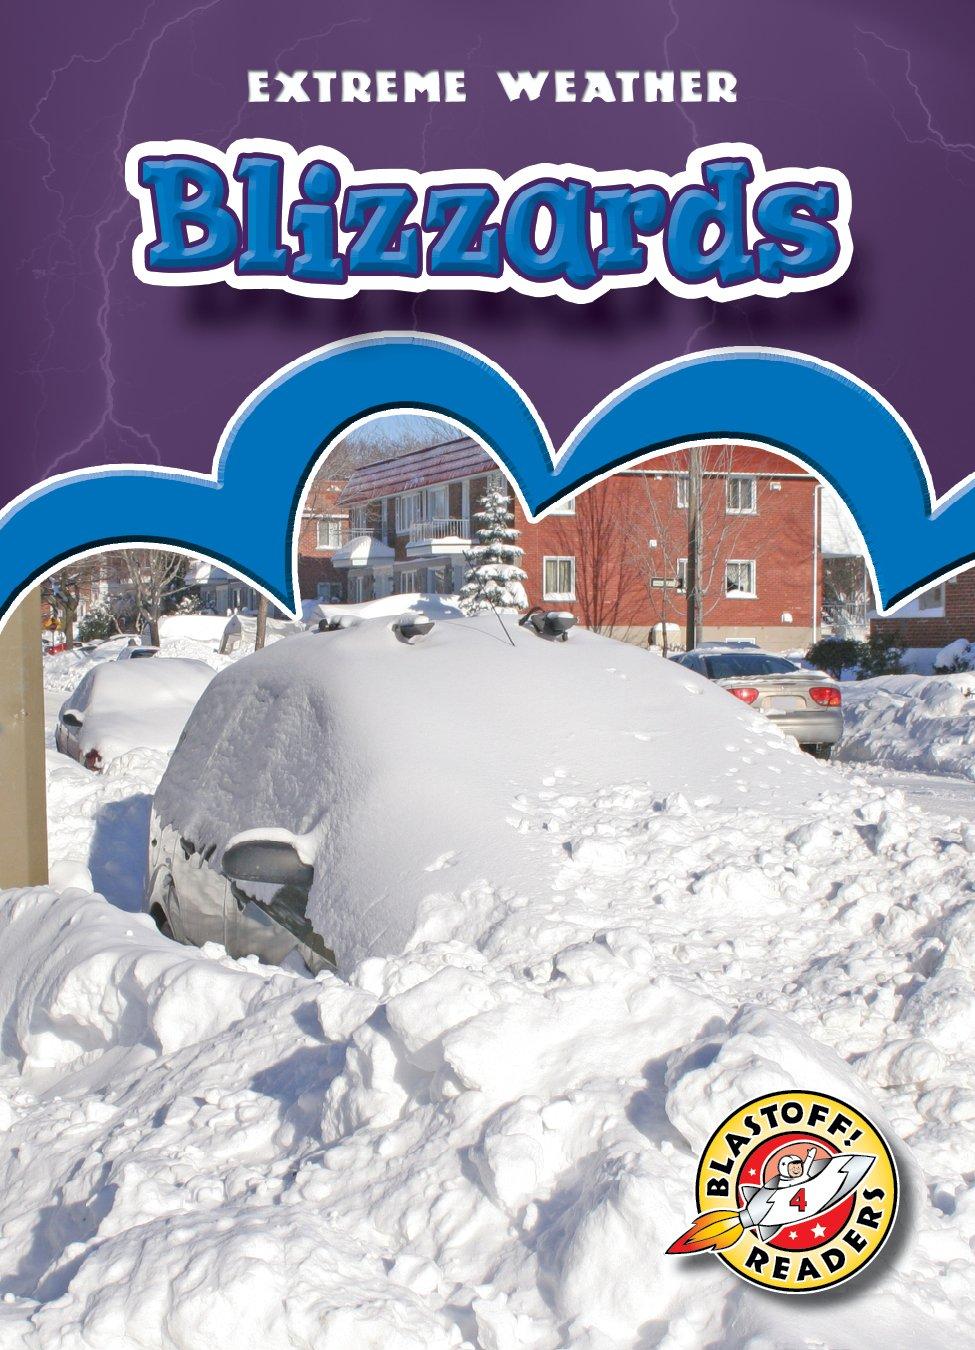 Blizzards (Blastoff! Readers: Extreme Weather) (Blastoff! Readers, Level 4: Extreme Weather)